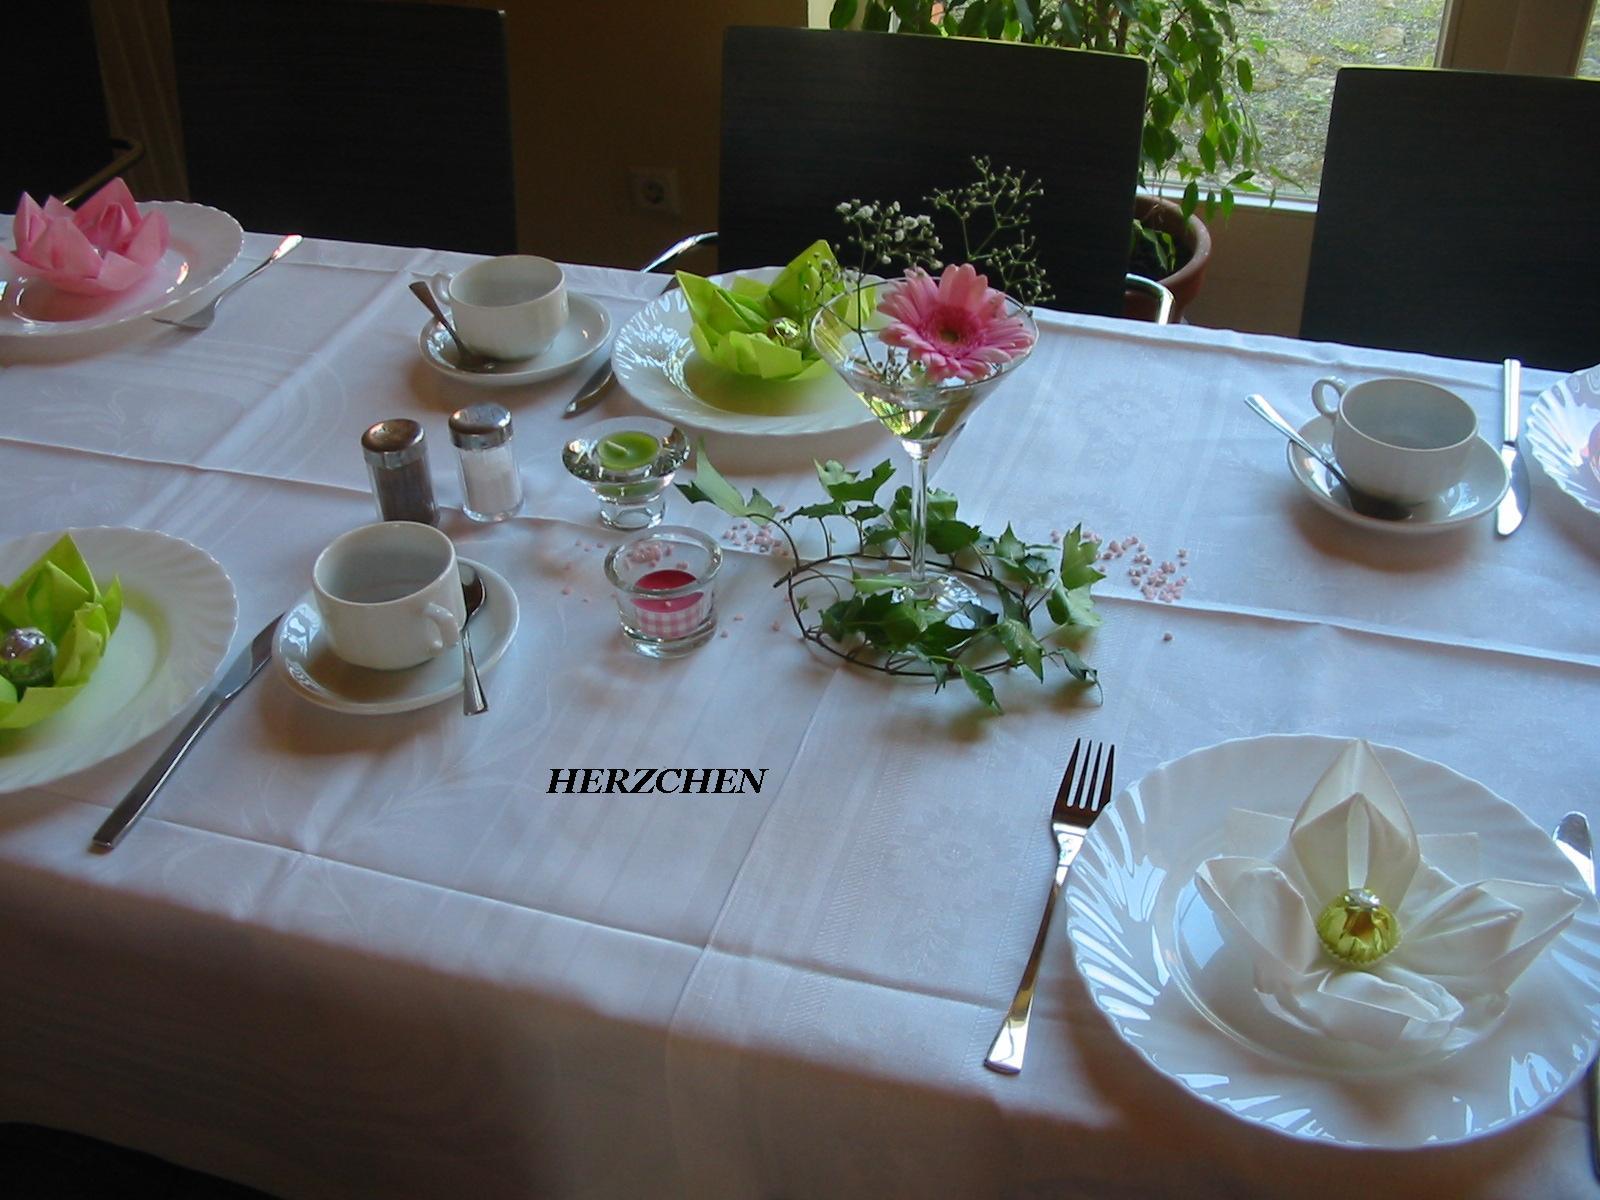 Herzchen tischdeko f r mama for Tischdeko 70 geburtstag ideen